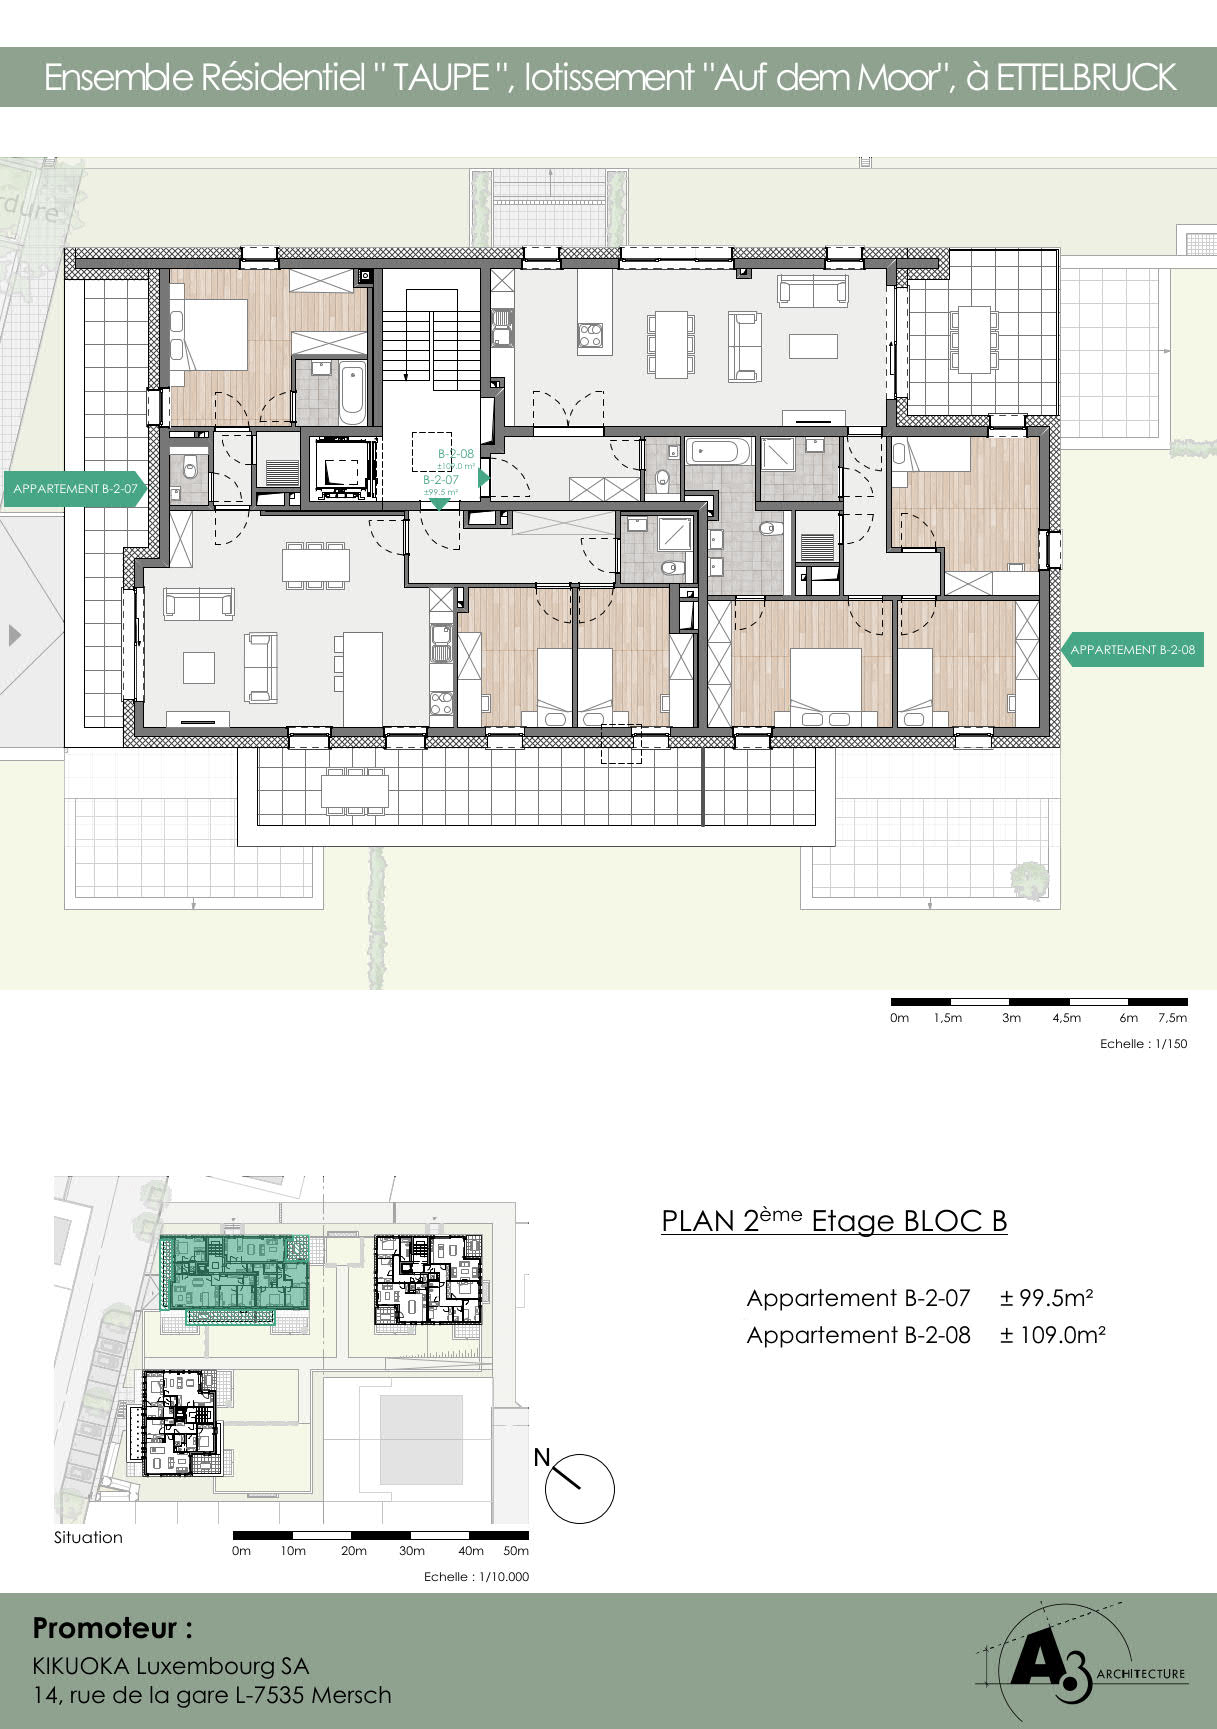 Bloc B: Etage 2